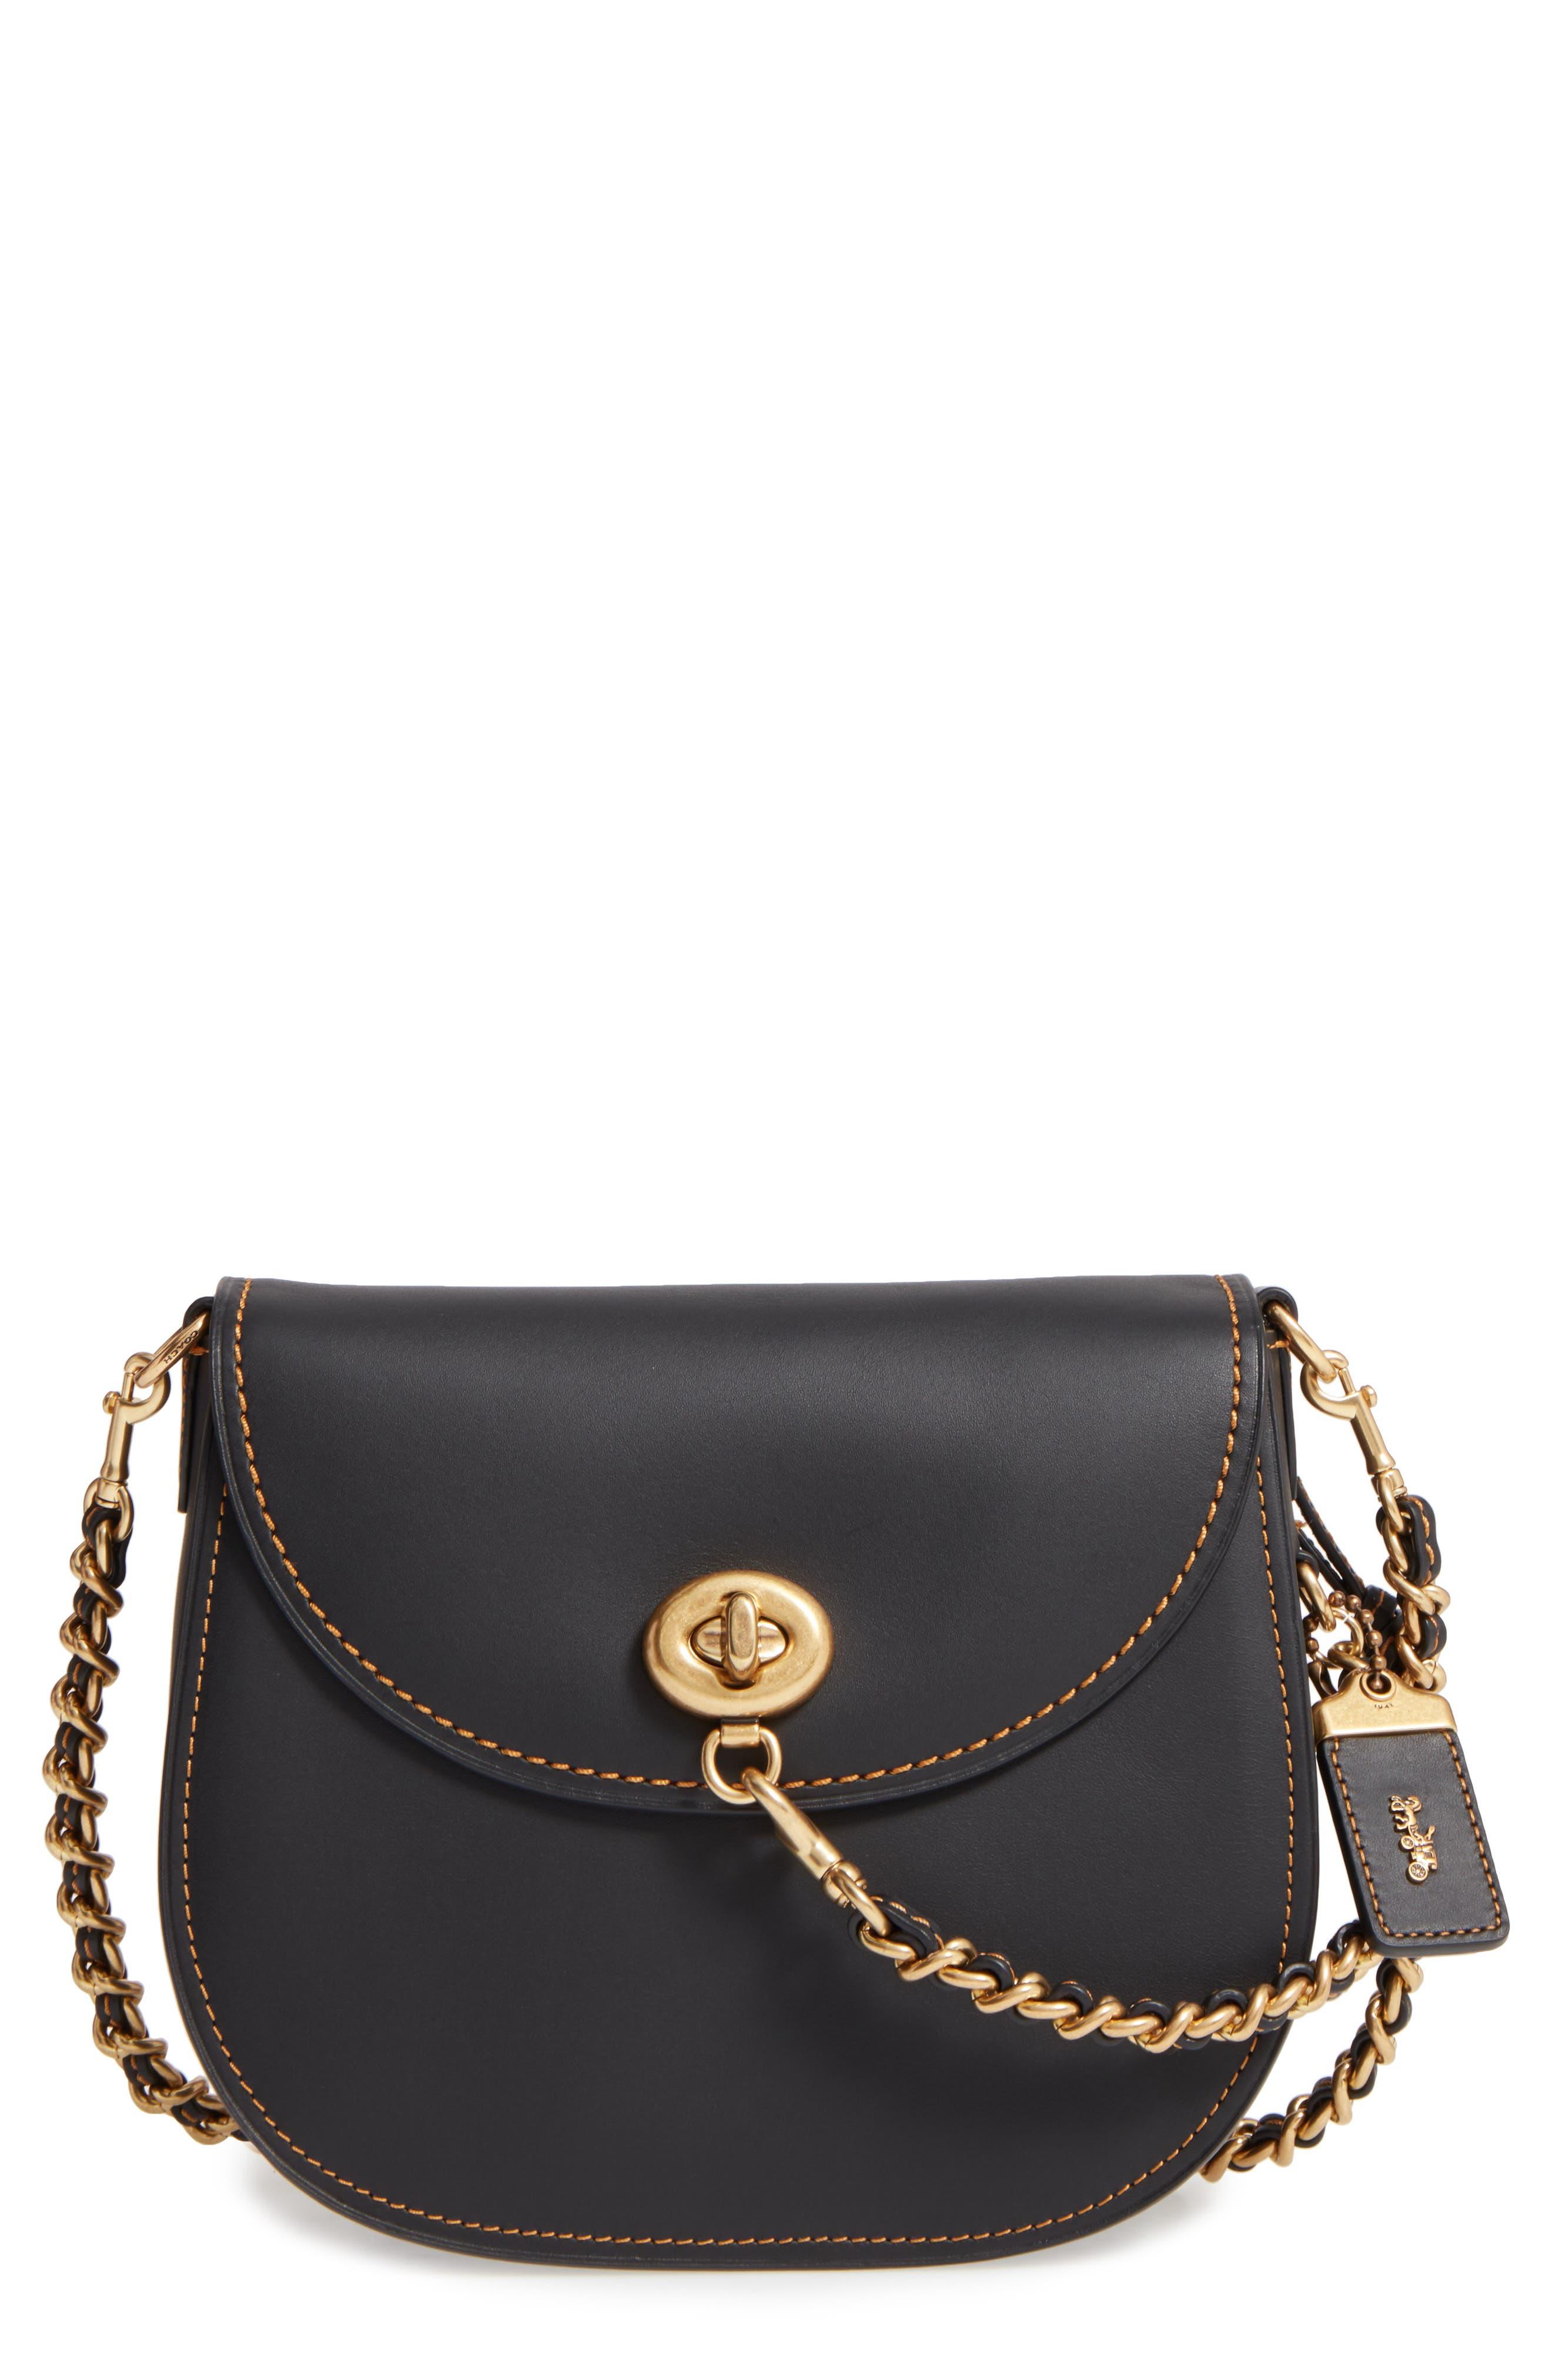 Leather Saddle Bag,                             Main thumbnail 1, color,                             005